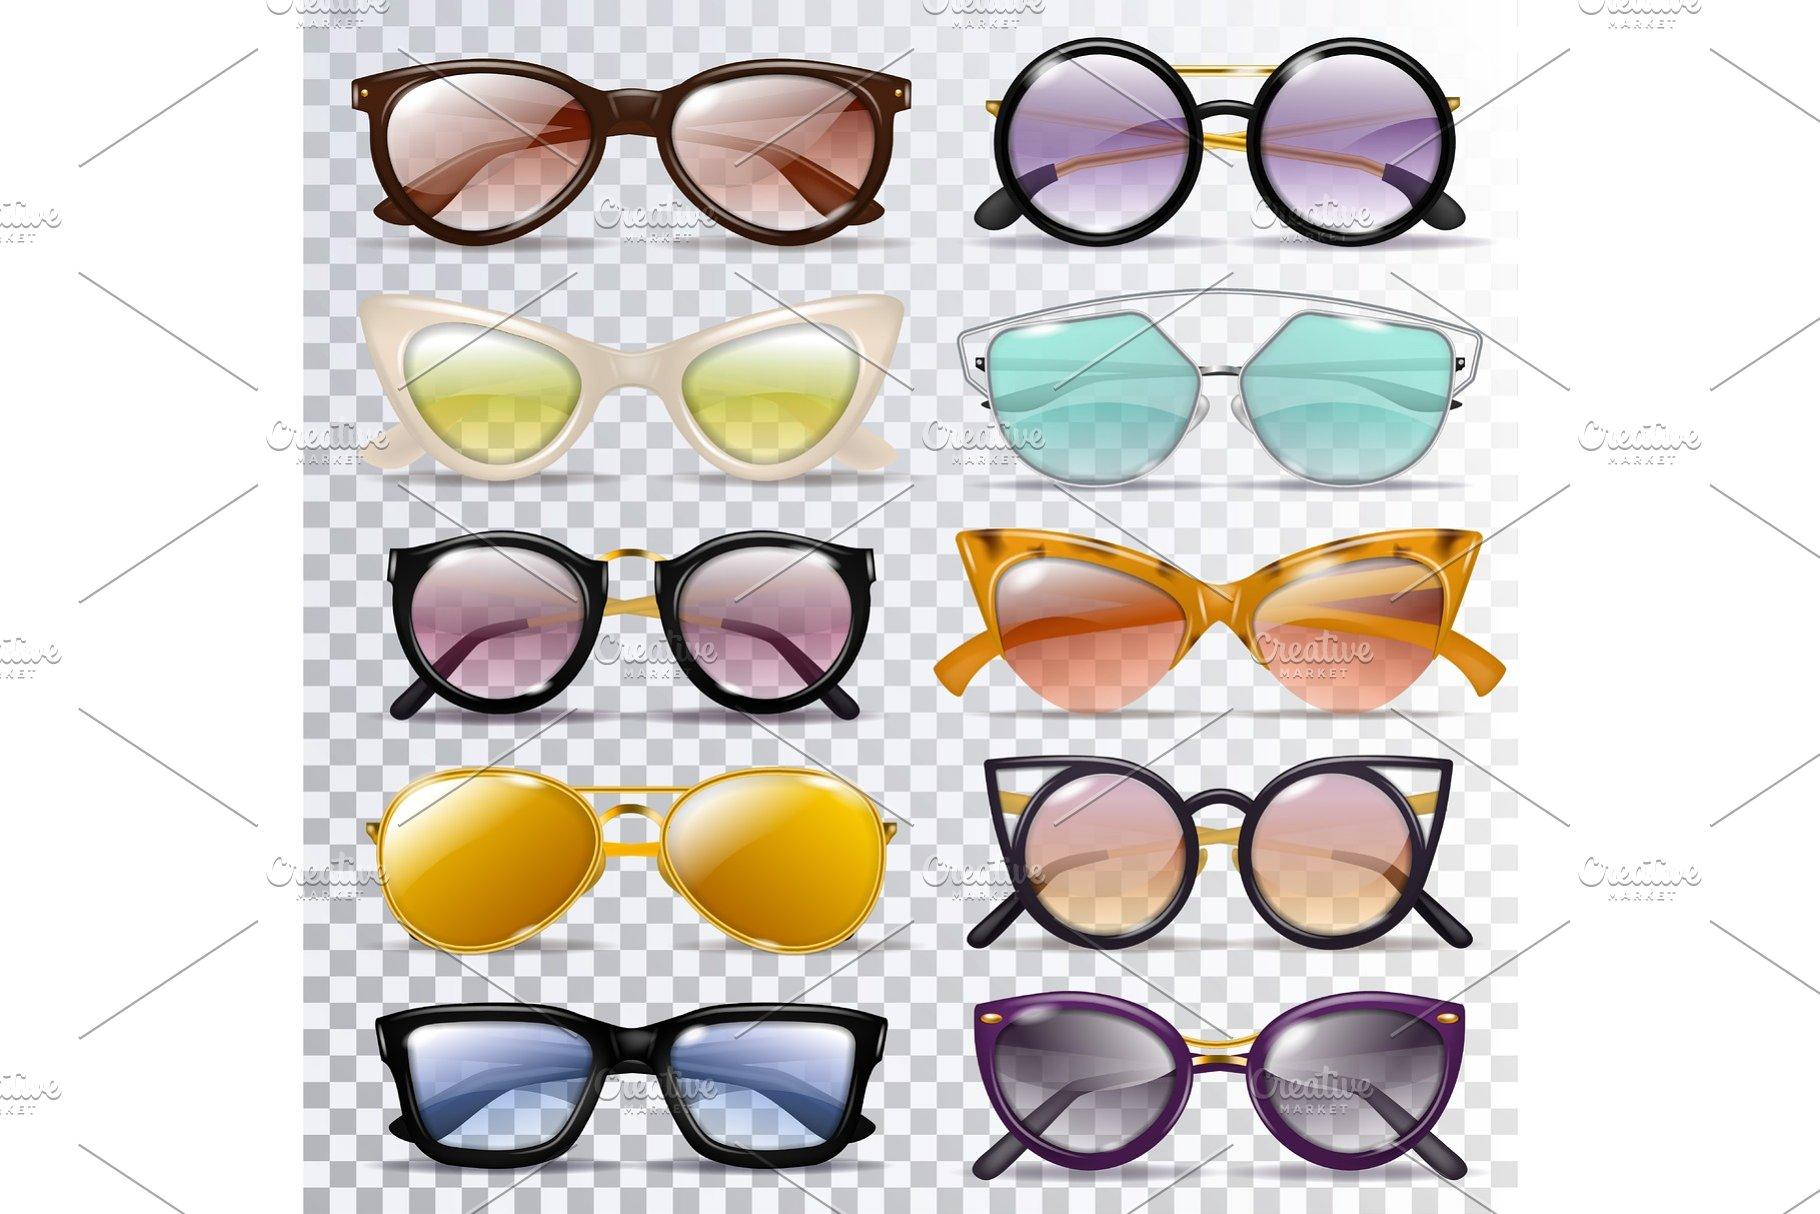 5a29f3bfcf9 Glasses vector cartoon eyeglasses or ~ Beauty   Fashion Photos ...